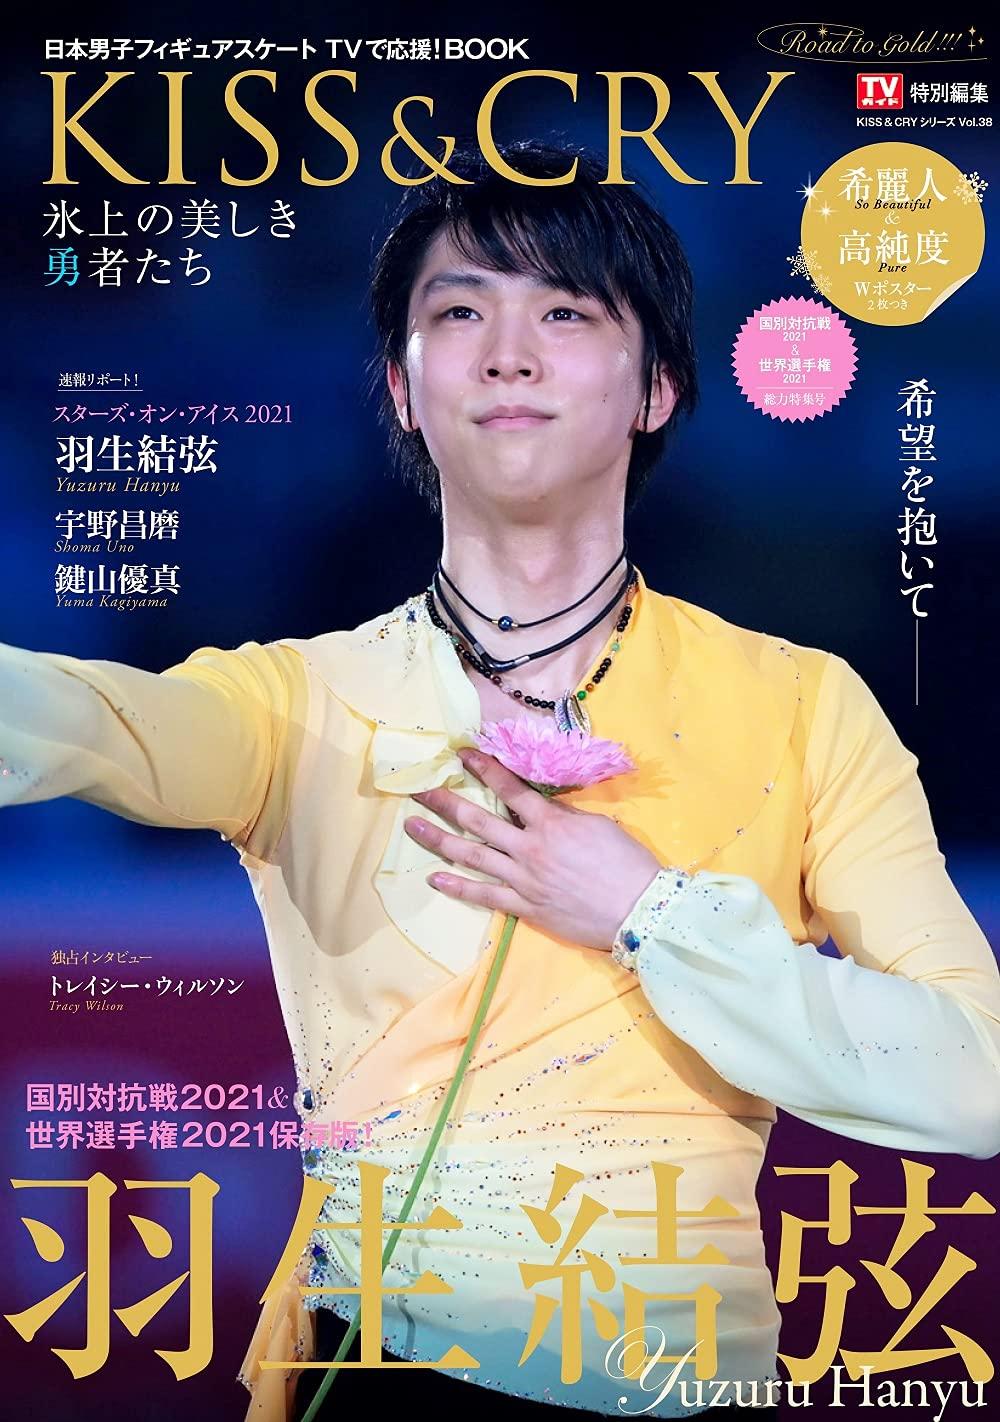 YuzuNews2021 da 21 a 31 Maggio